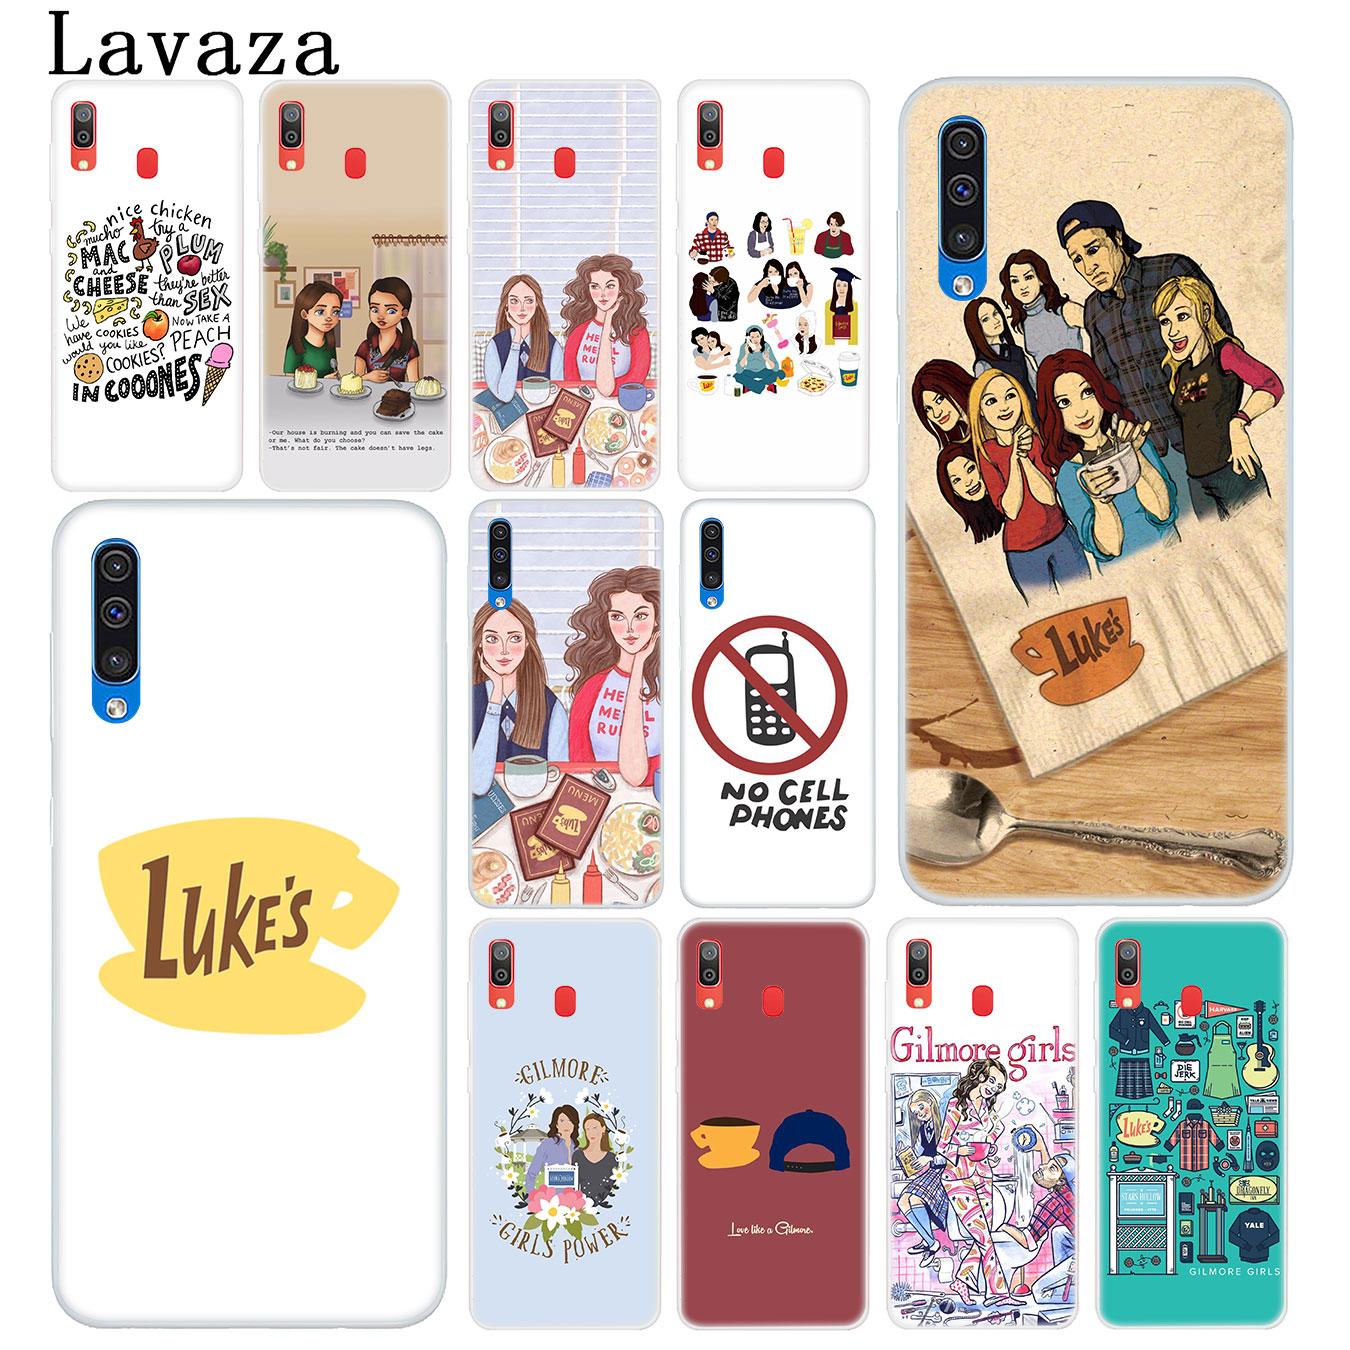 Funda rígida para teléfono móvil de Lavaza Gilmore Girls Life para Samsung Galaxy A10, A20, A30, A40, A50, A60, A70, M10, M20, M30, M40, A20e